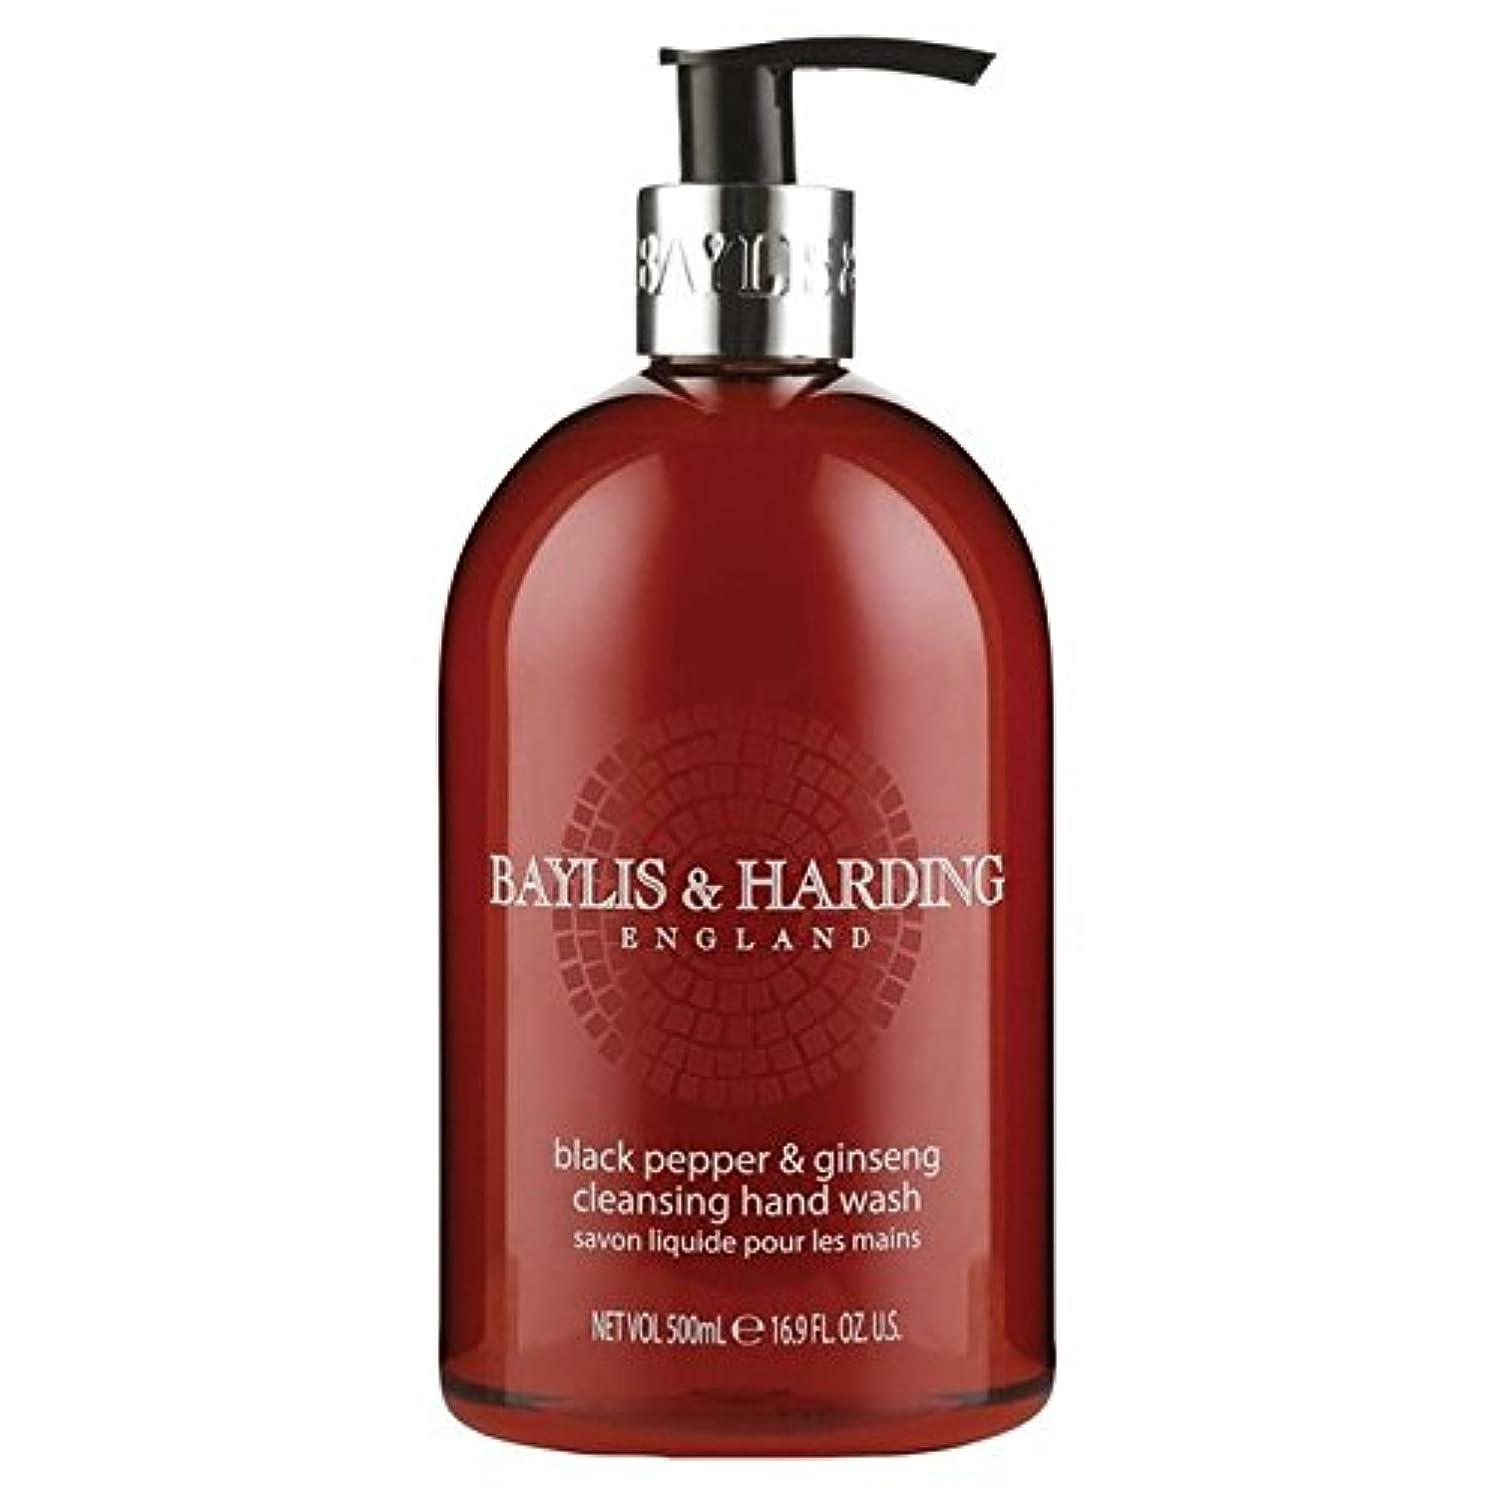 Baylis & Harding Black Pepper & Ginseng Hand Wash 500ml - ベイリス&ハーディングブラックペッパー&人参のハンドウォッシュ500ミリリットル [並行輸入品]